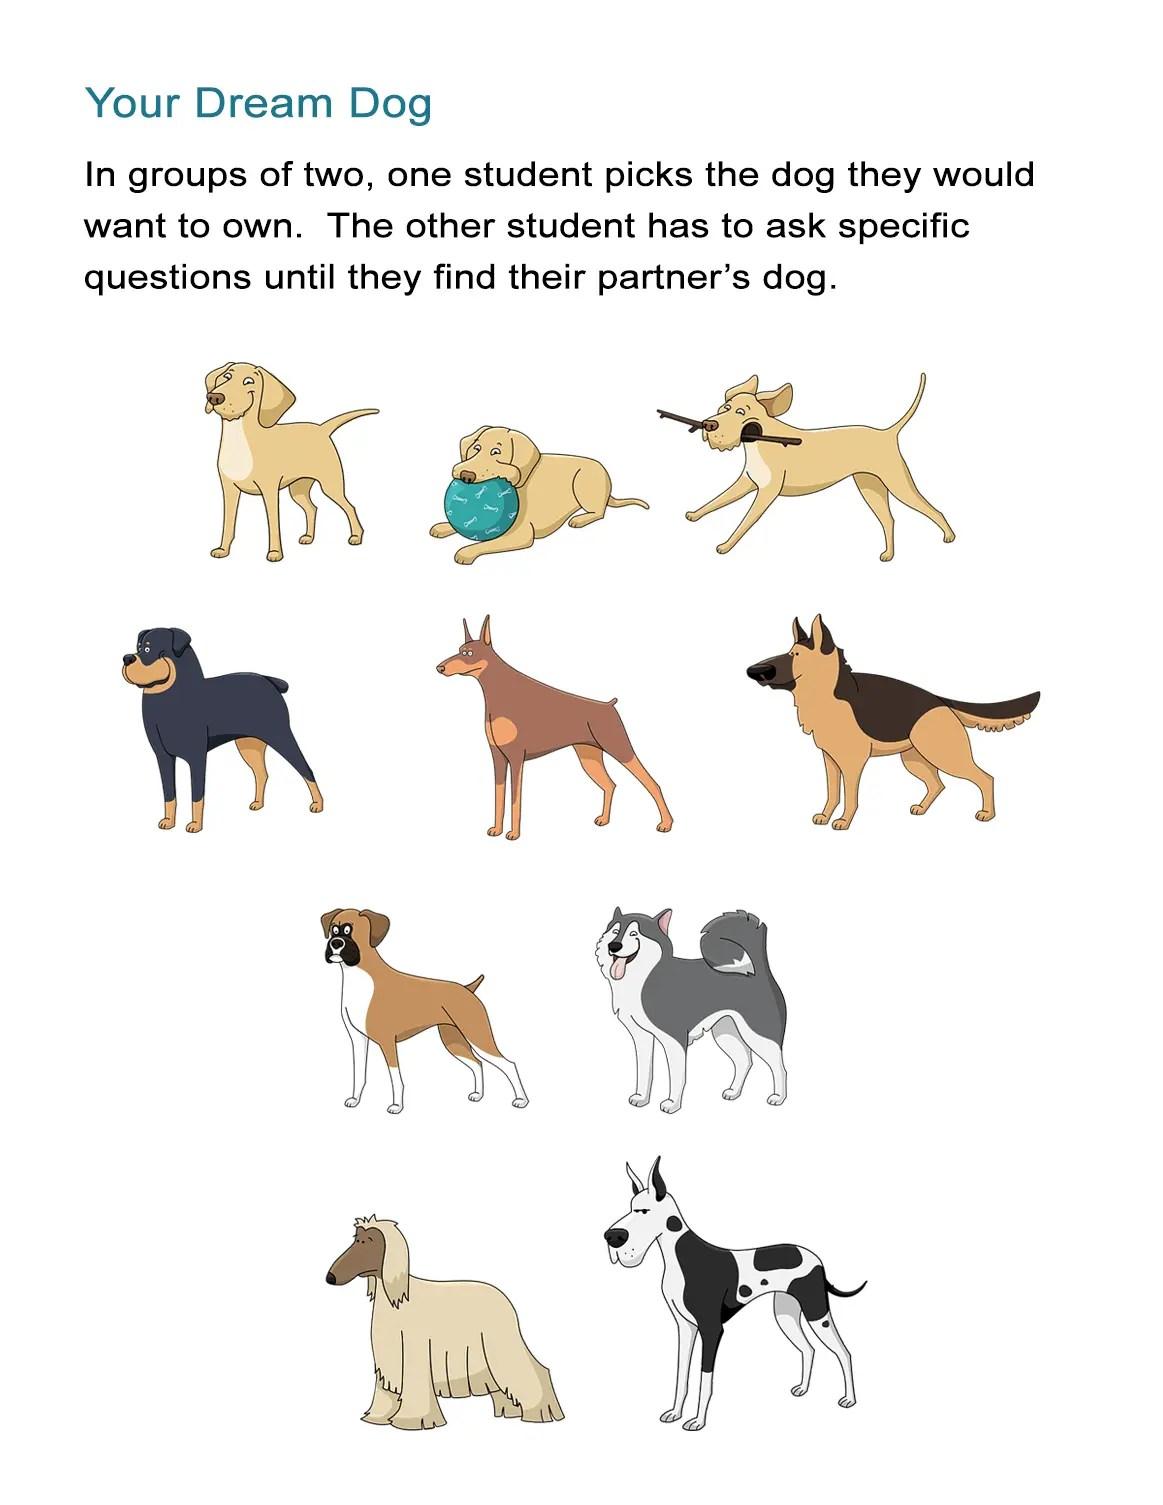 Describe Your Dream Dog